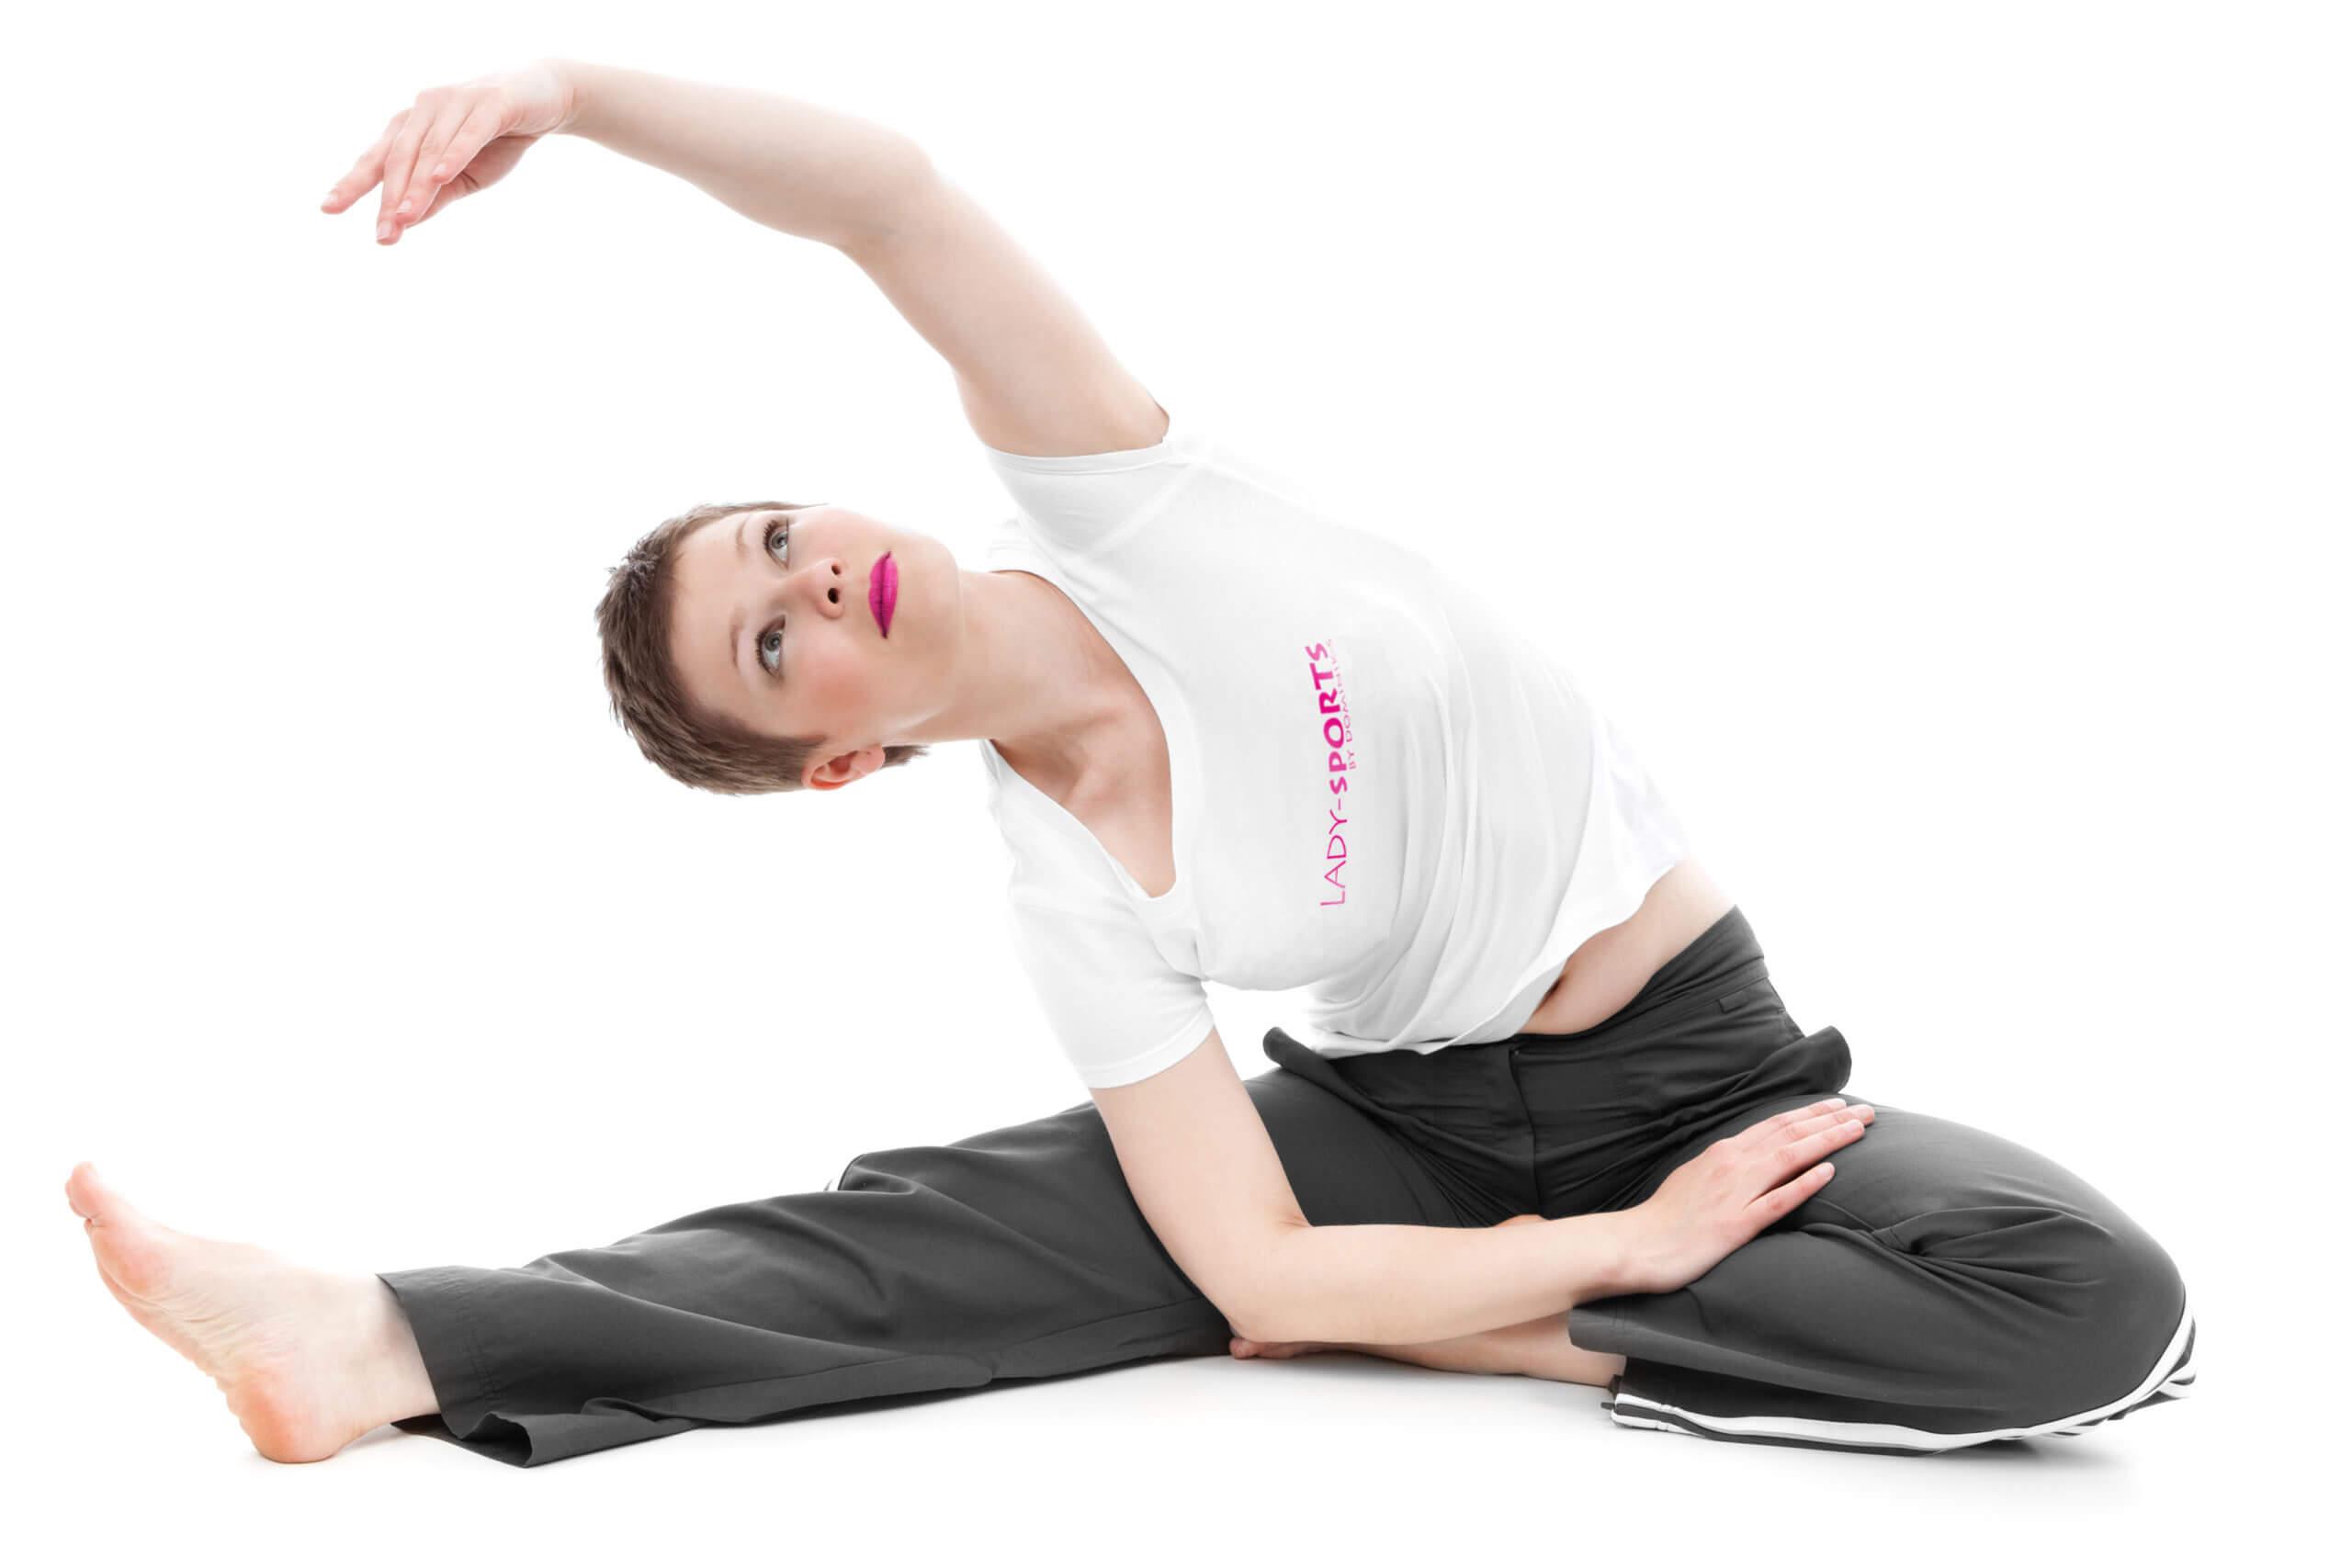 Lady-Sports-Fitnessstudio-fuer-Frauen-Bleib-Flexibel-Preise-Abos